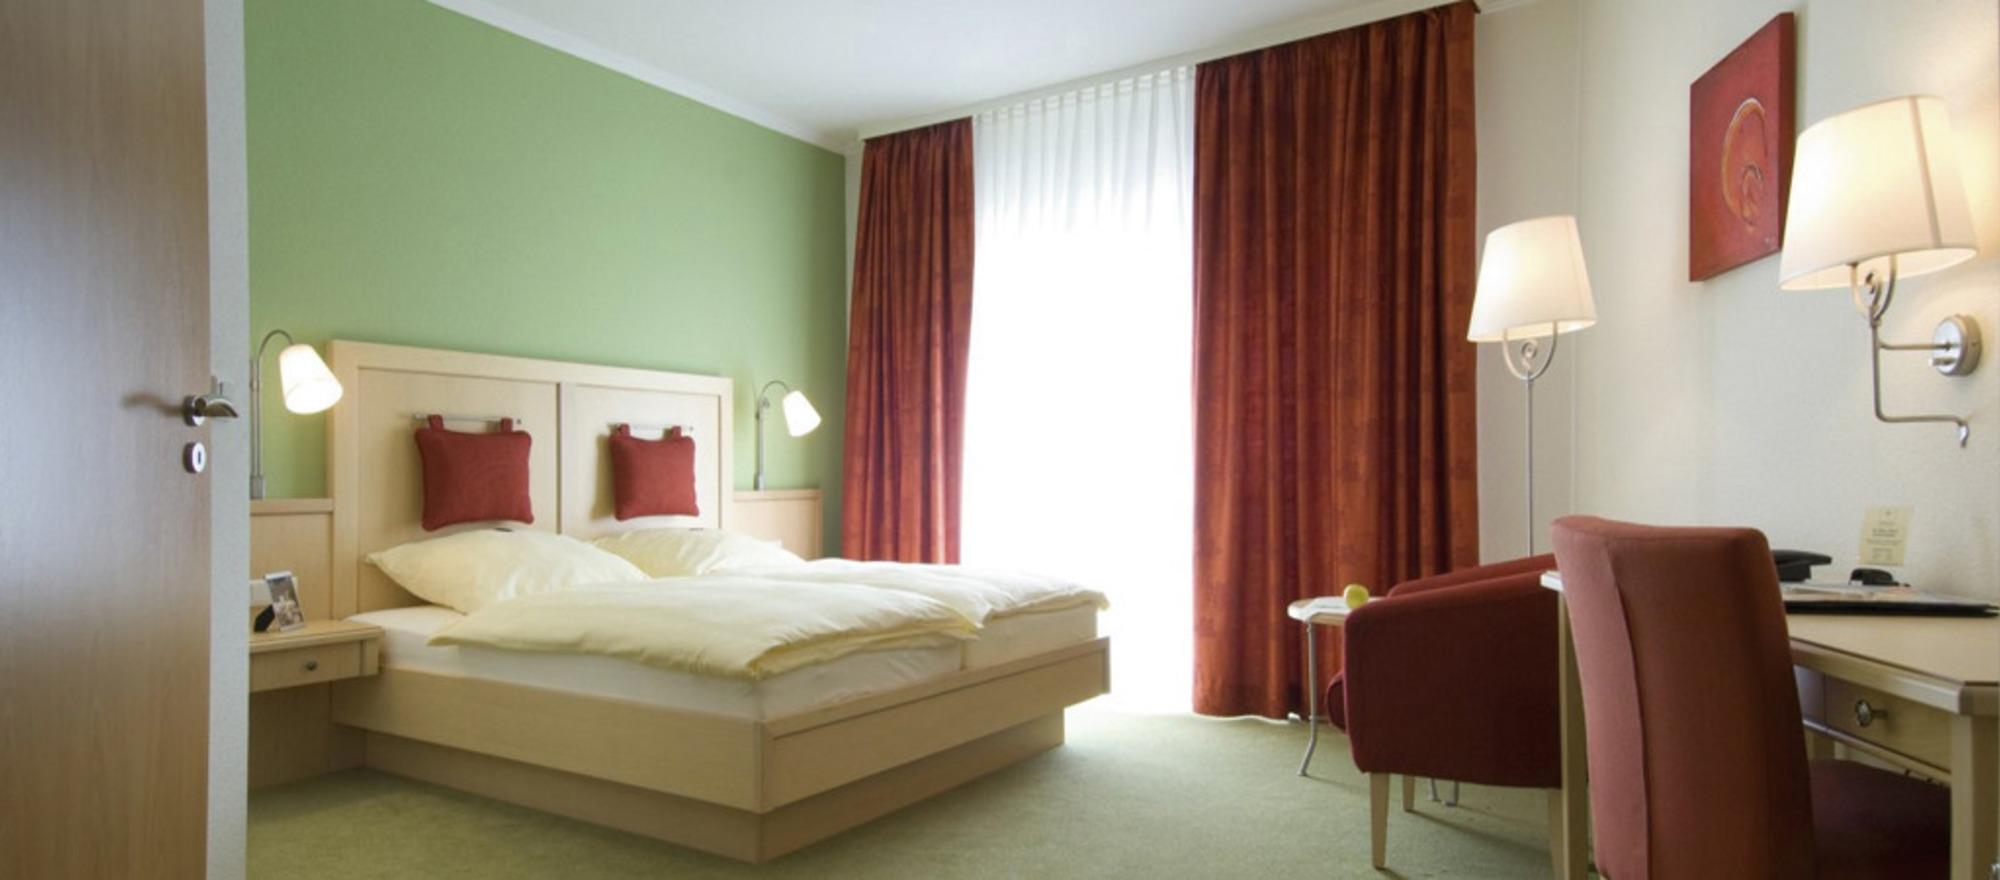 ringhotel appelbaum in g tersloh nordrhein westfalen ringhotels. Black Bedroom Furniture Sets. Home Design Ideas